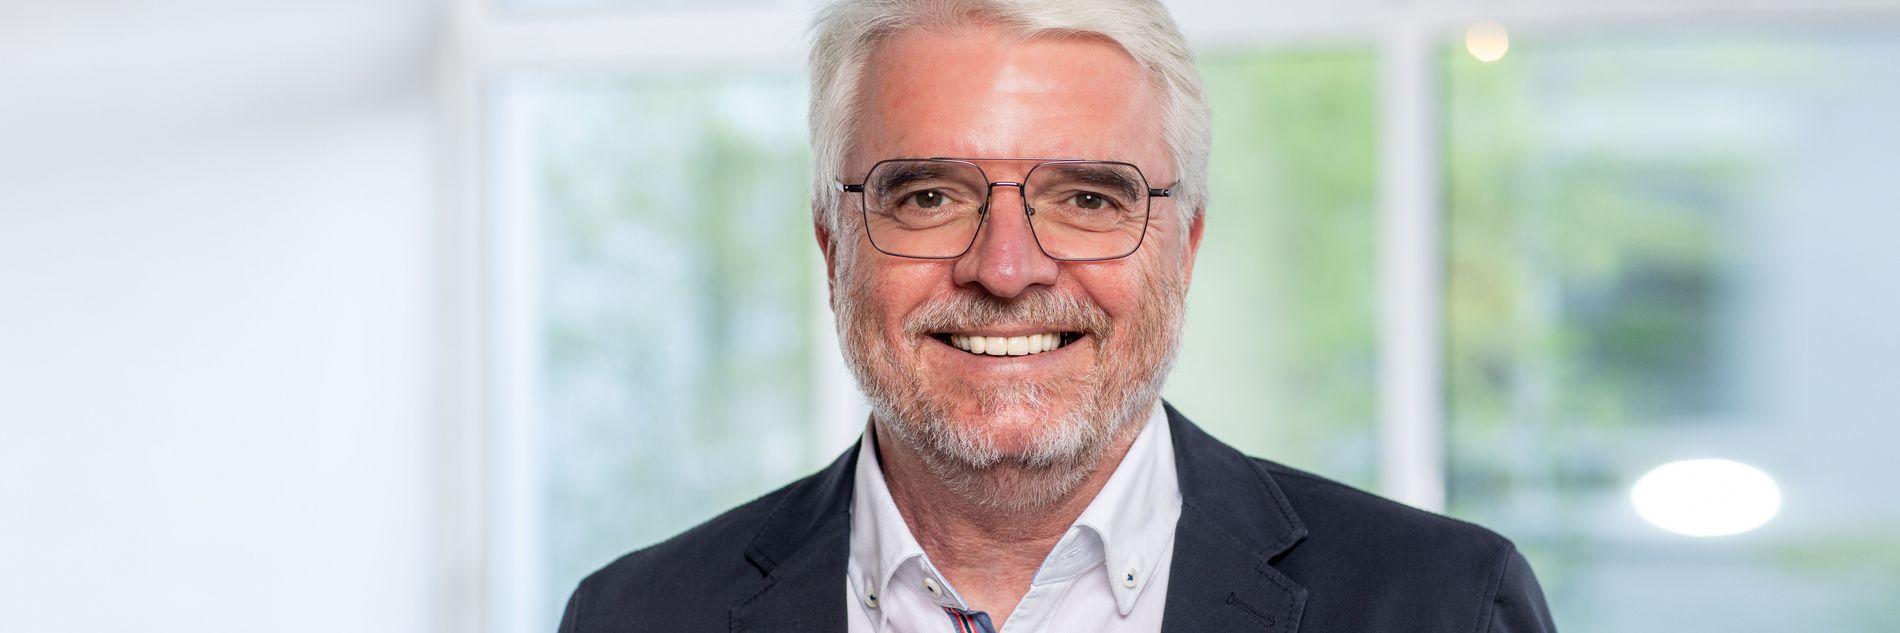 Markus Birmele, Diplom-Psychologe